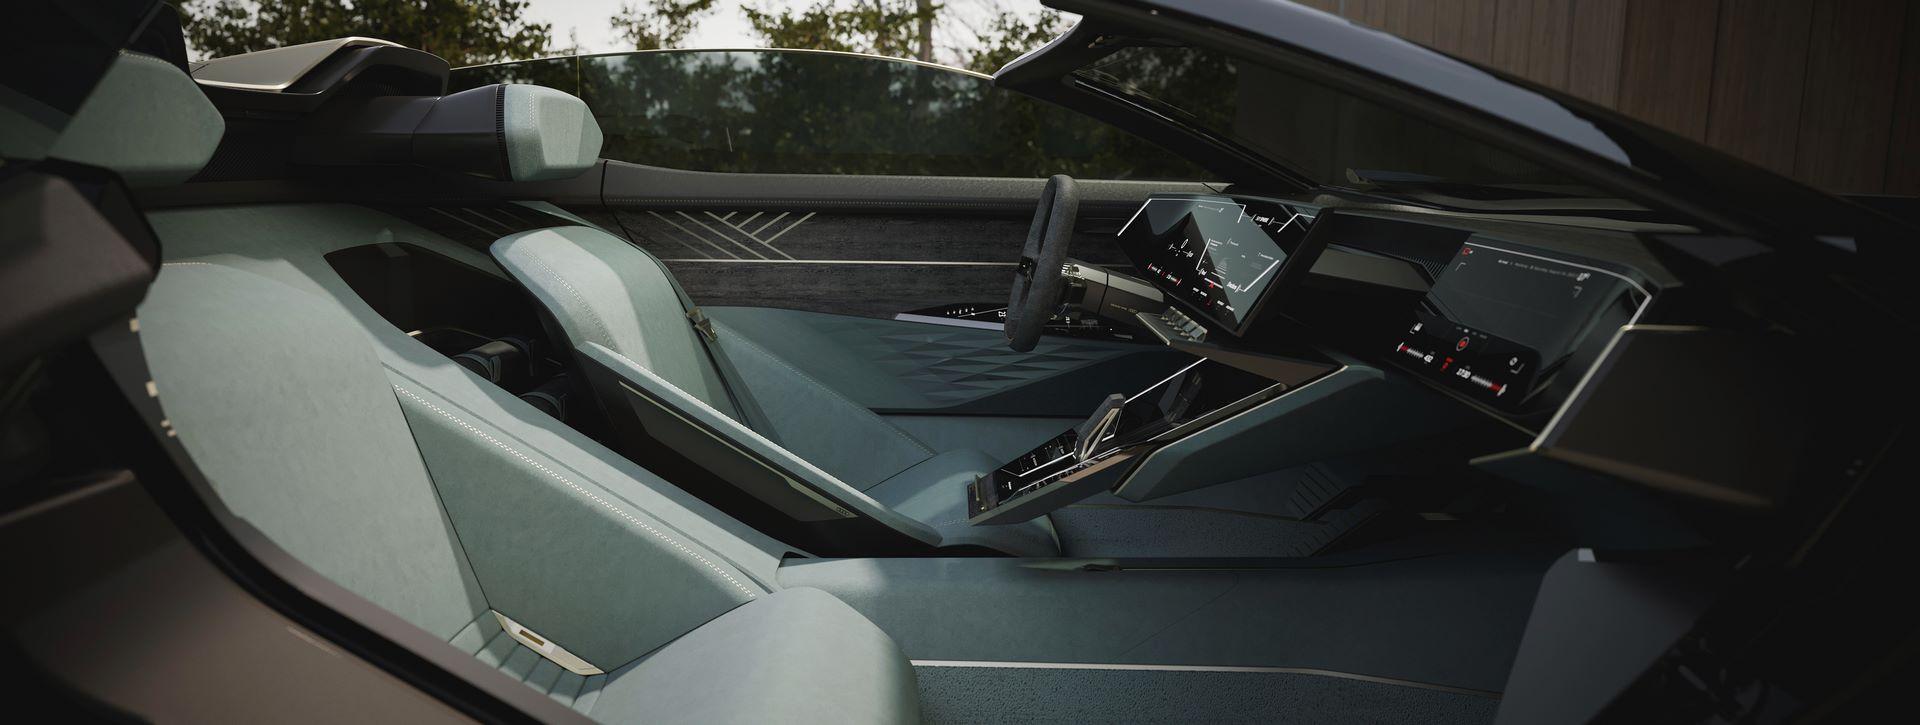 Audi-Skysphere-Concept-21